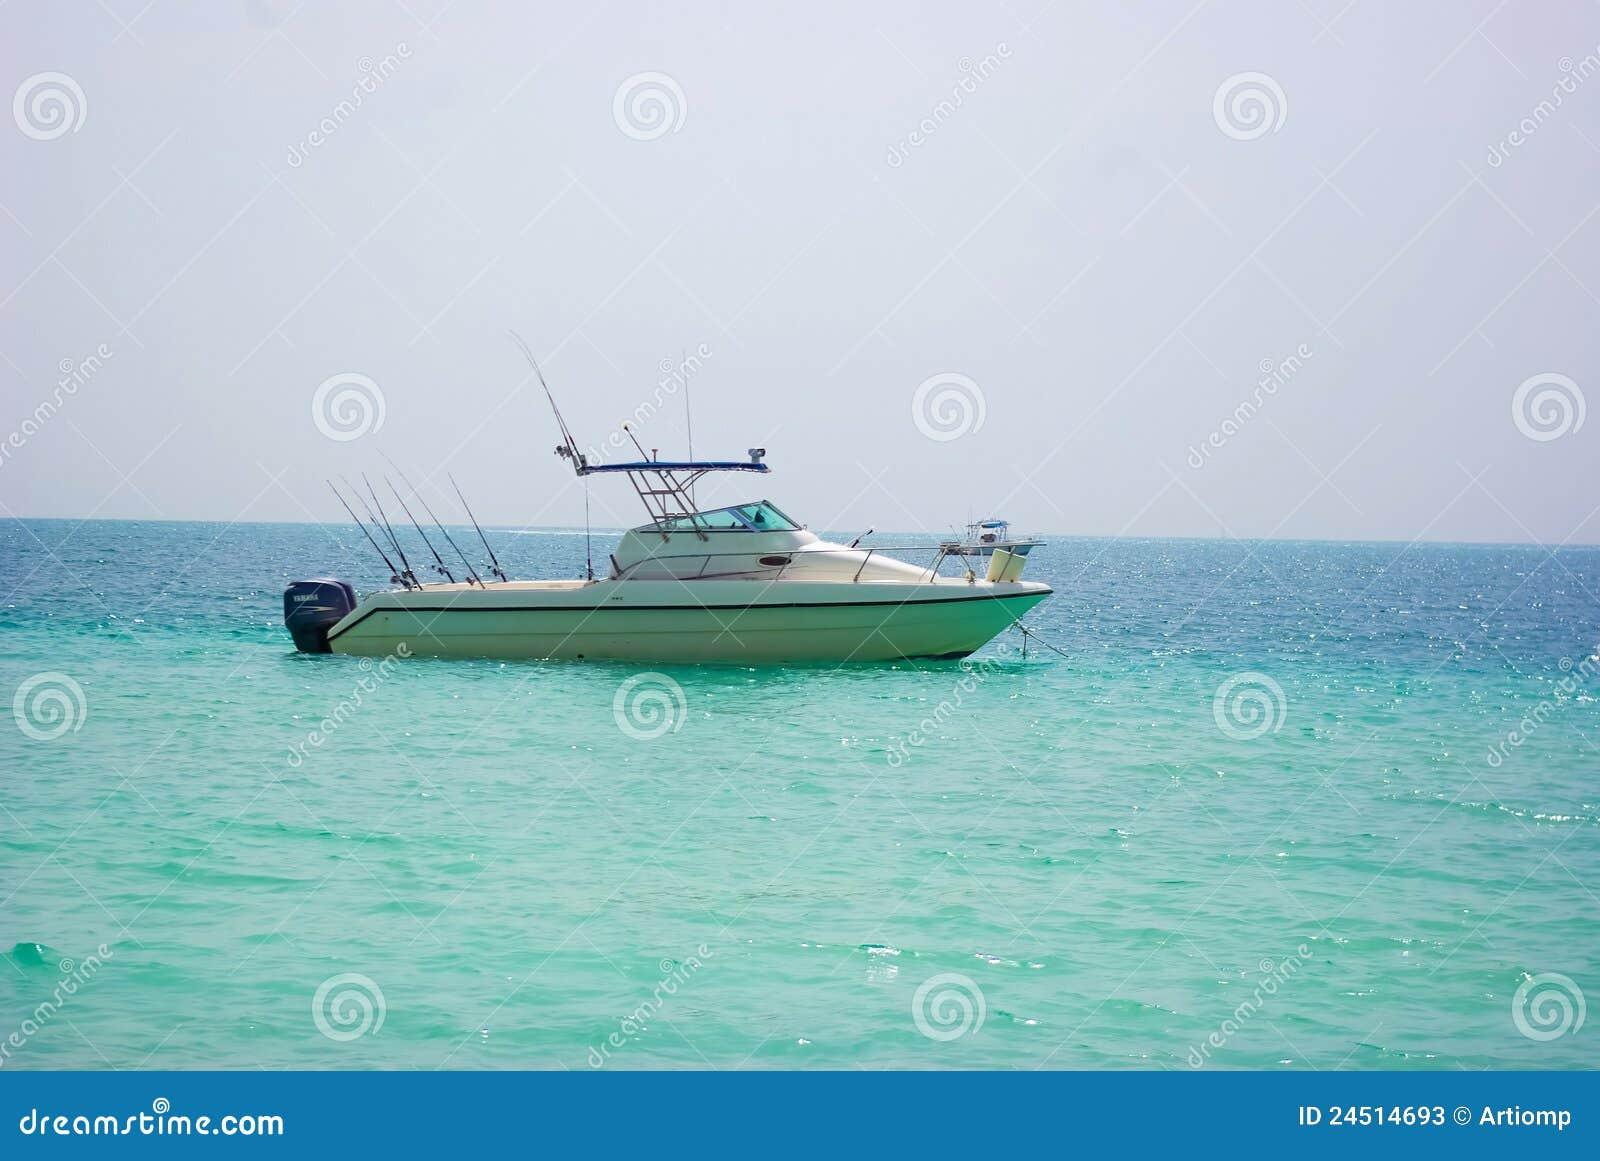 Fishing boat in dubai stock photos image 24514693 for Fishing in dubai